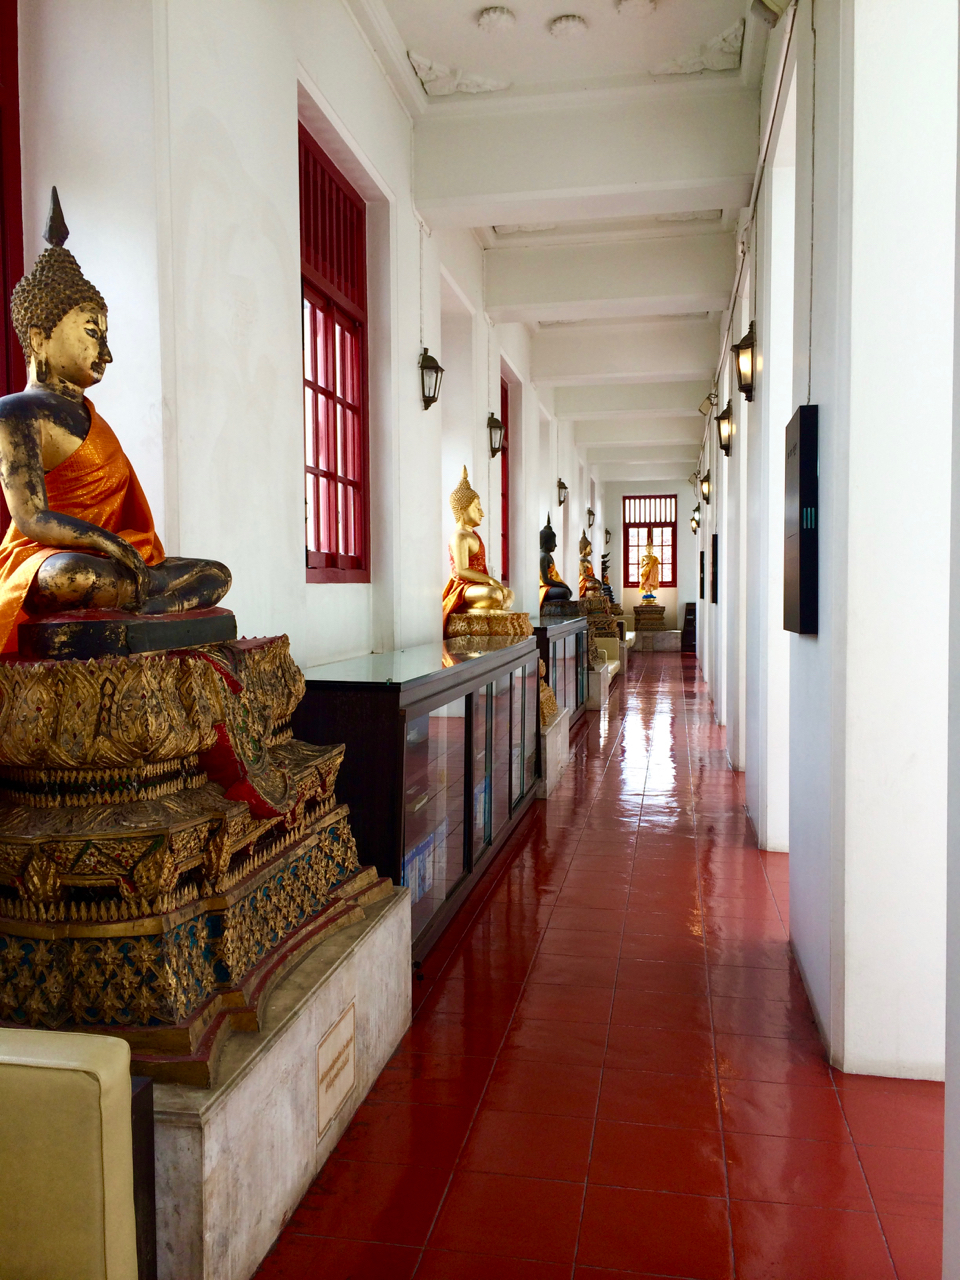 Buddha's inside a temple